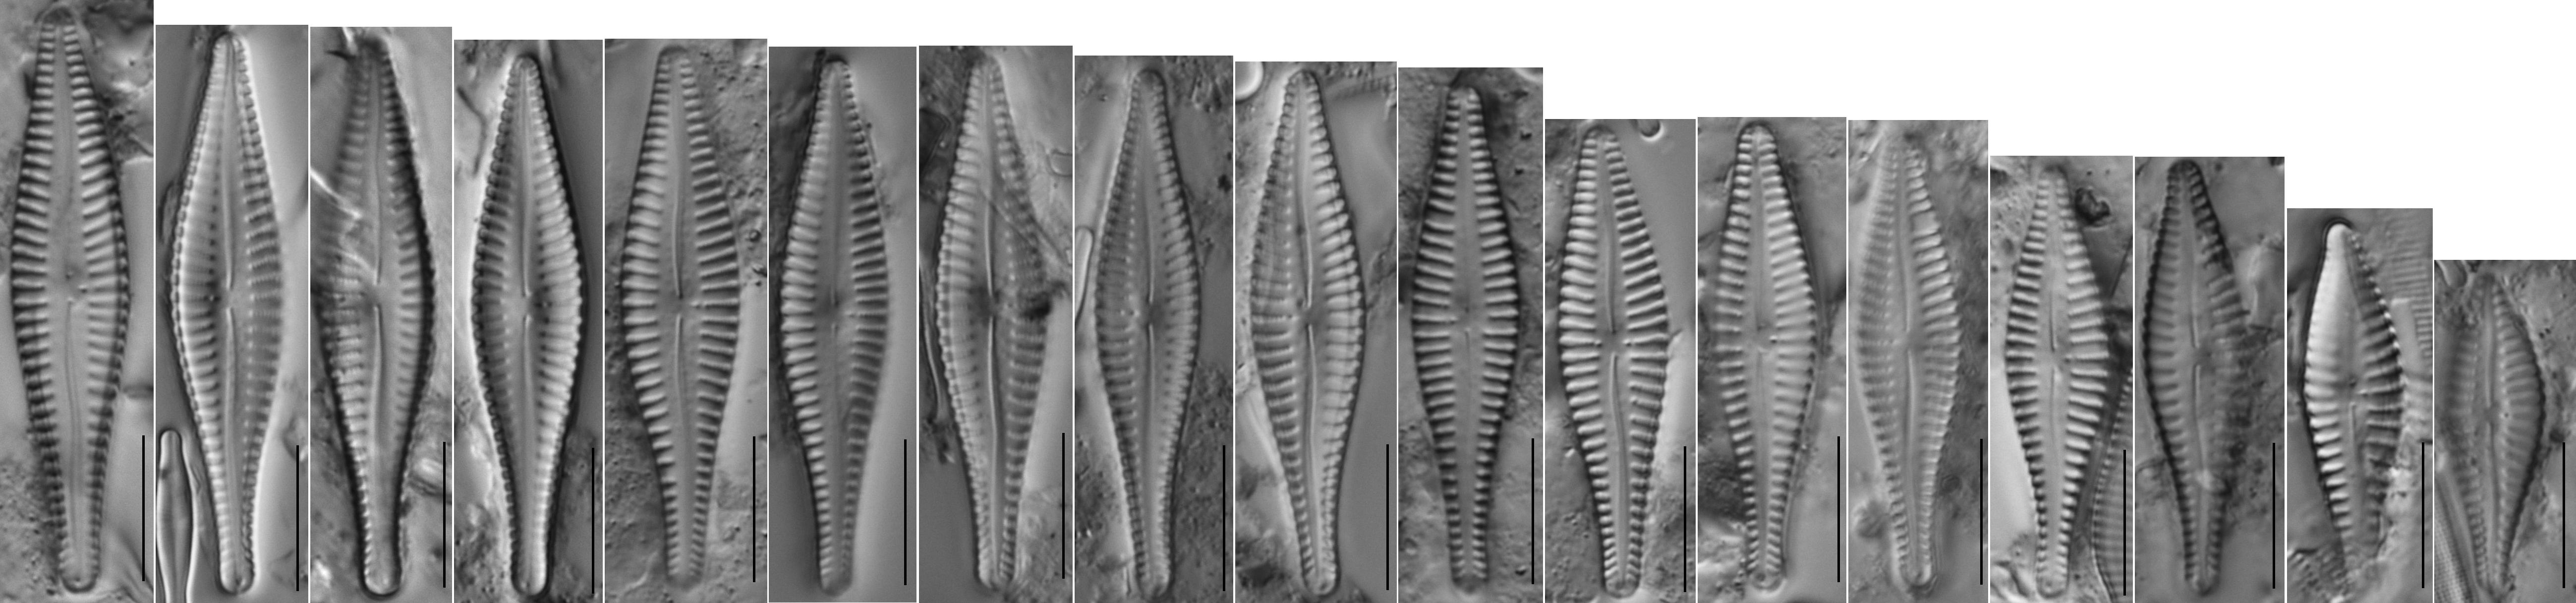 Gomphonema Gibba Plate  Fl